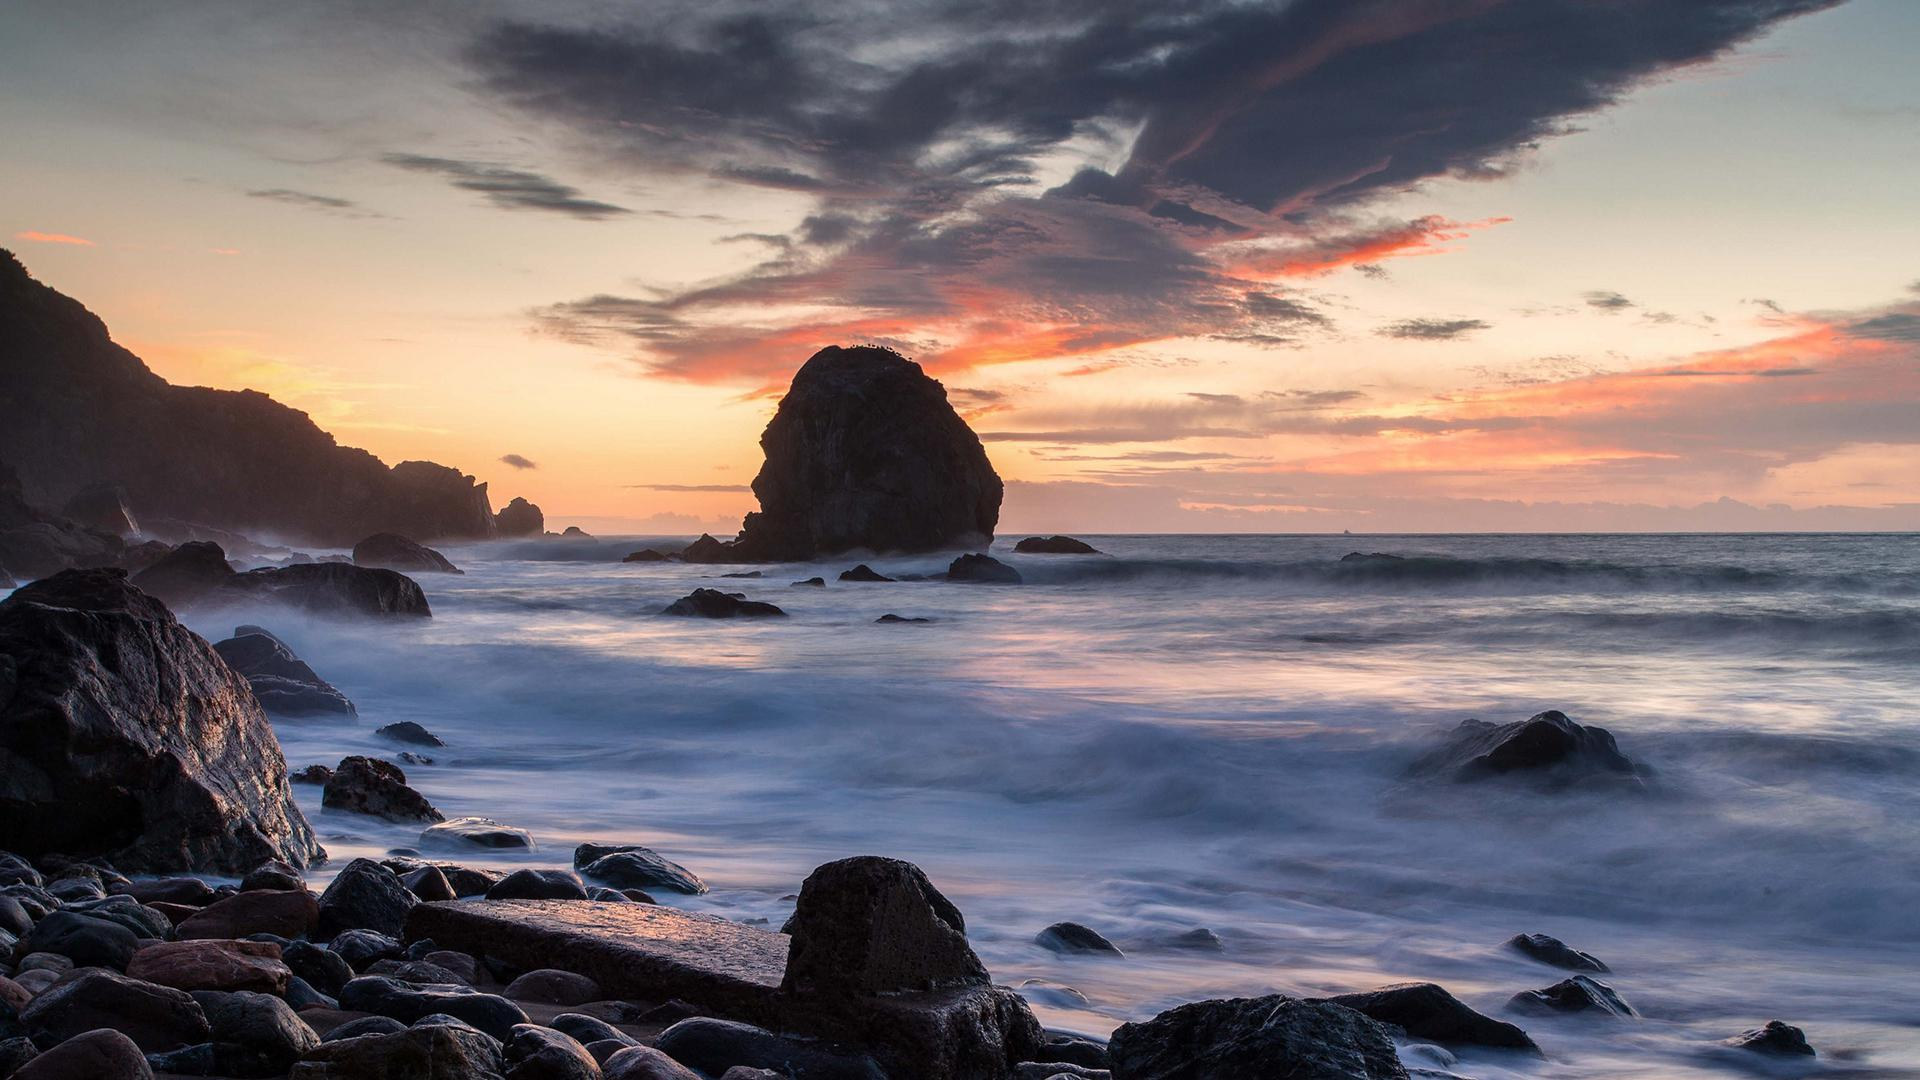 Baby Girl Wallpaper Full Hd Beach Ocean Rocks Stones Sea Shore Sky Clouds Waves